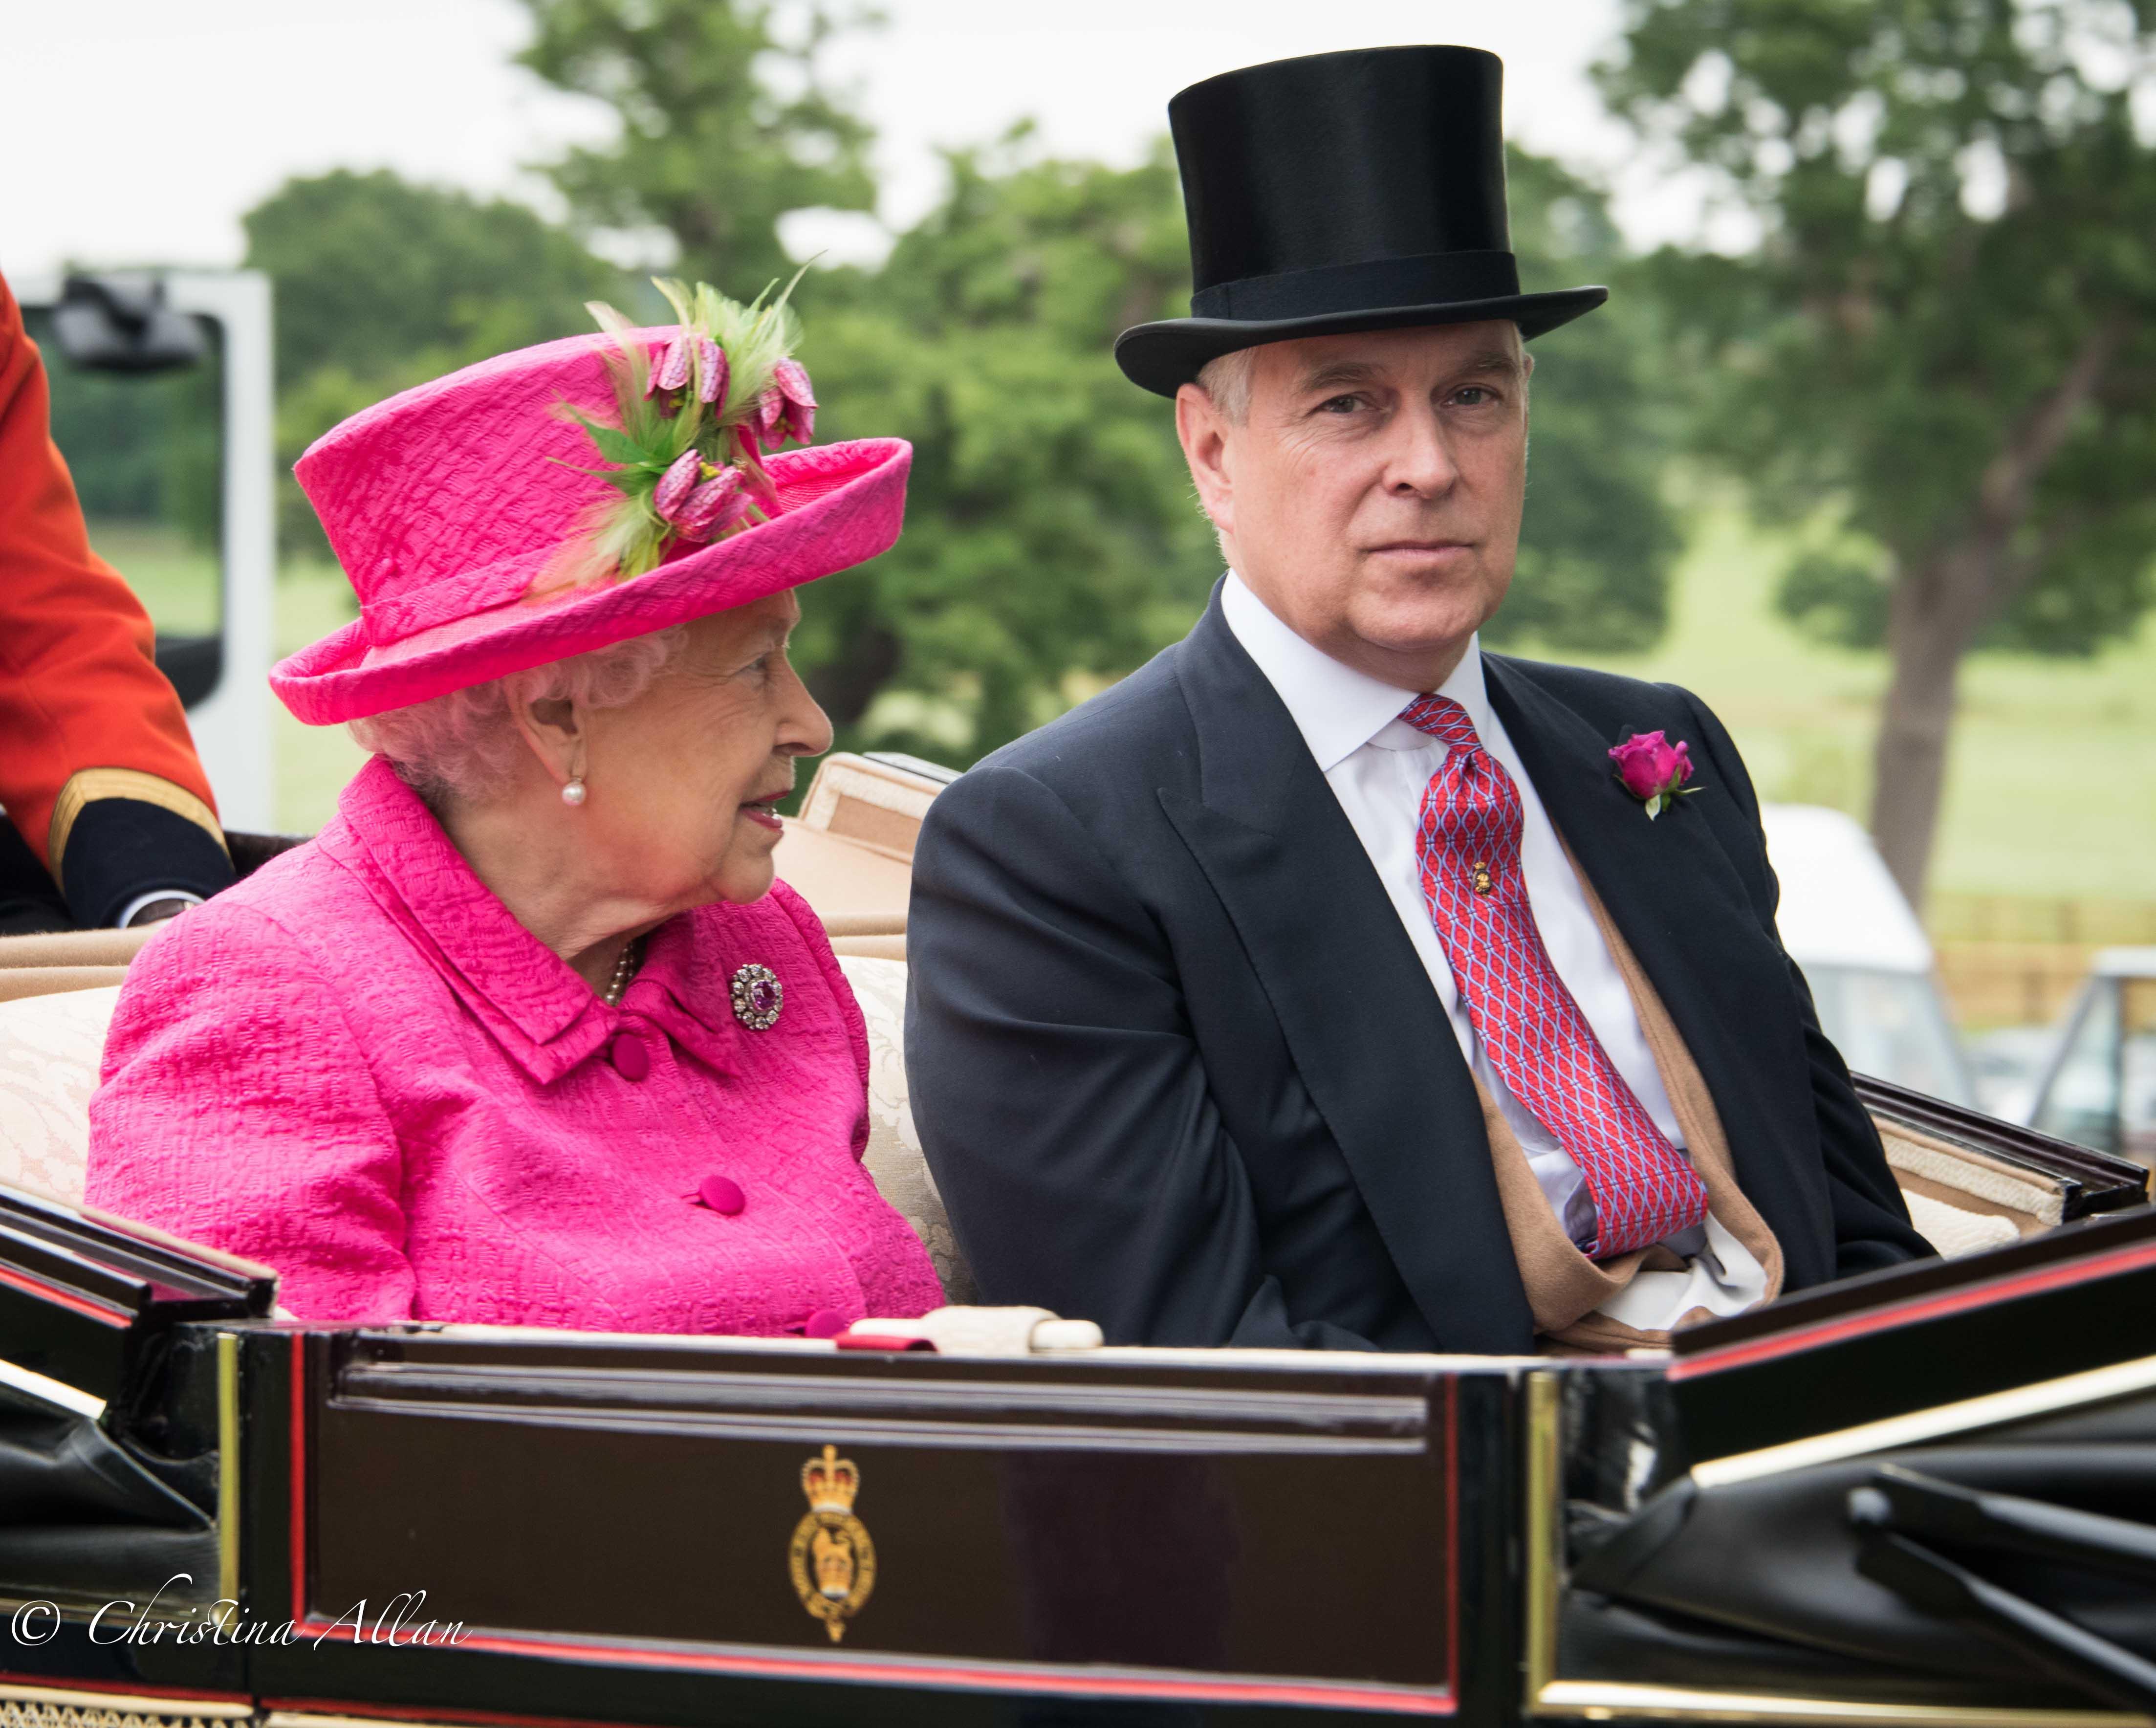 HM Queen Elizabeth II with Prince Andrew Duke of York